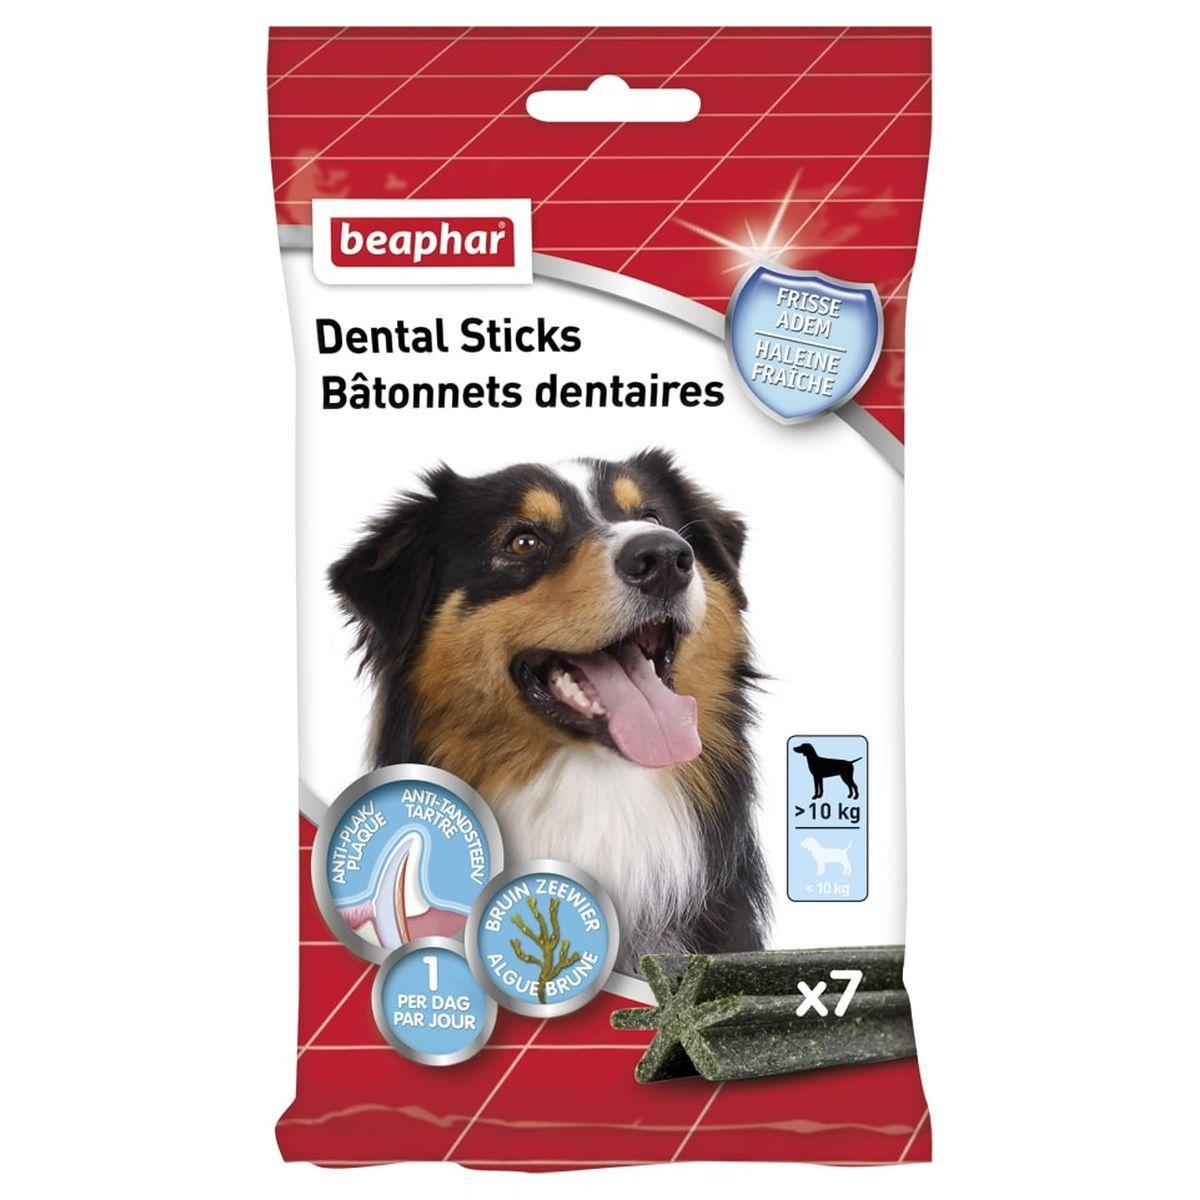 Beaphar dentalsticks